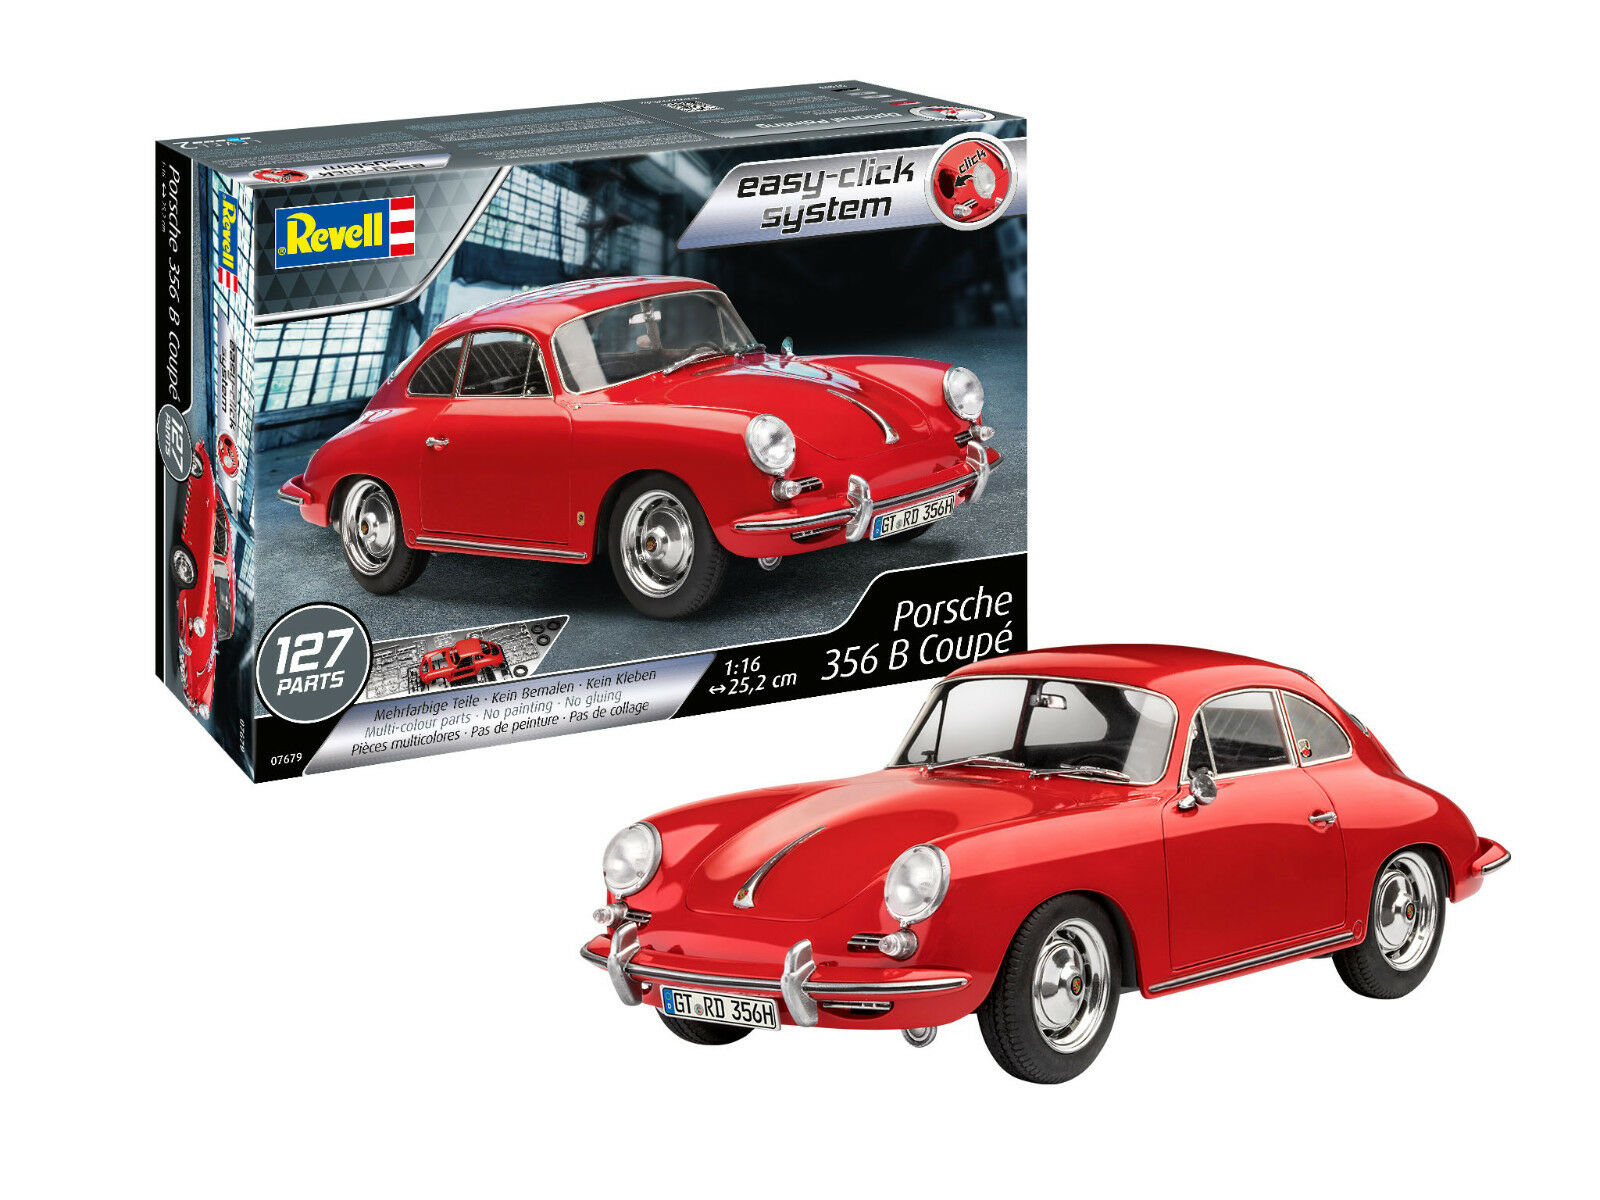 PORSCHE 356 Coupe, Revell Kit Auto 1 16, art. 07679